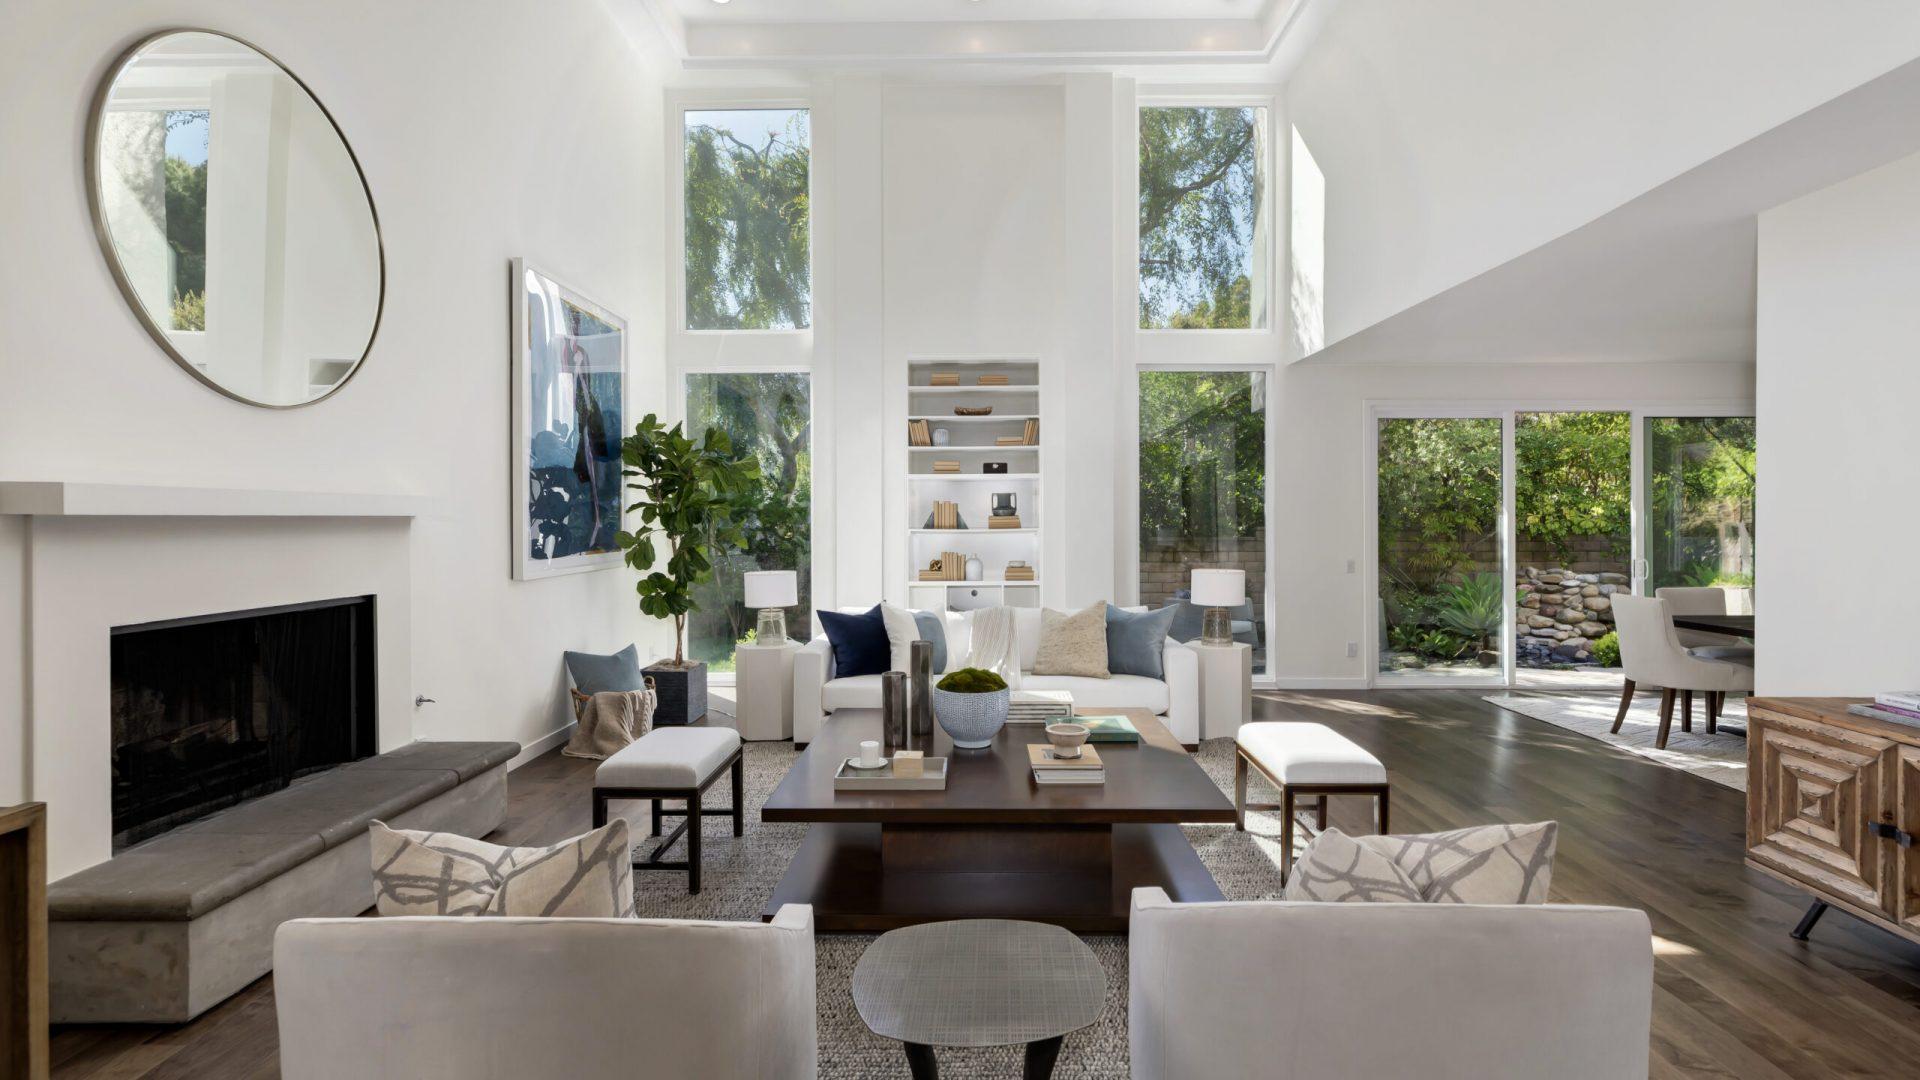 17151 Santa Ynez Interior living area